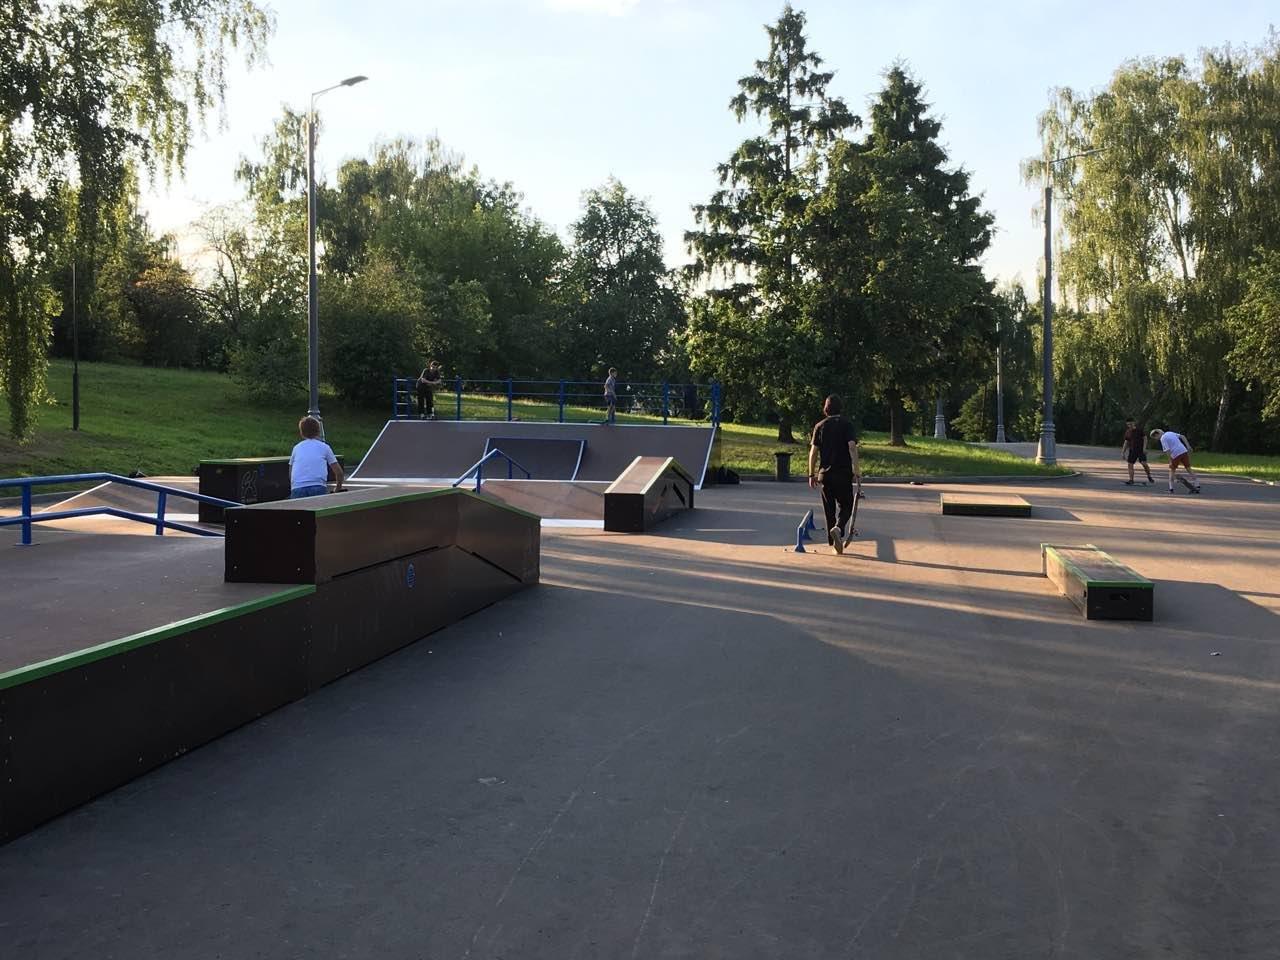 обучение скейтбордингу за МКАД